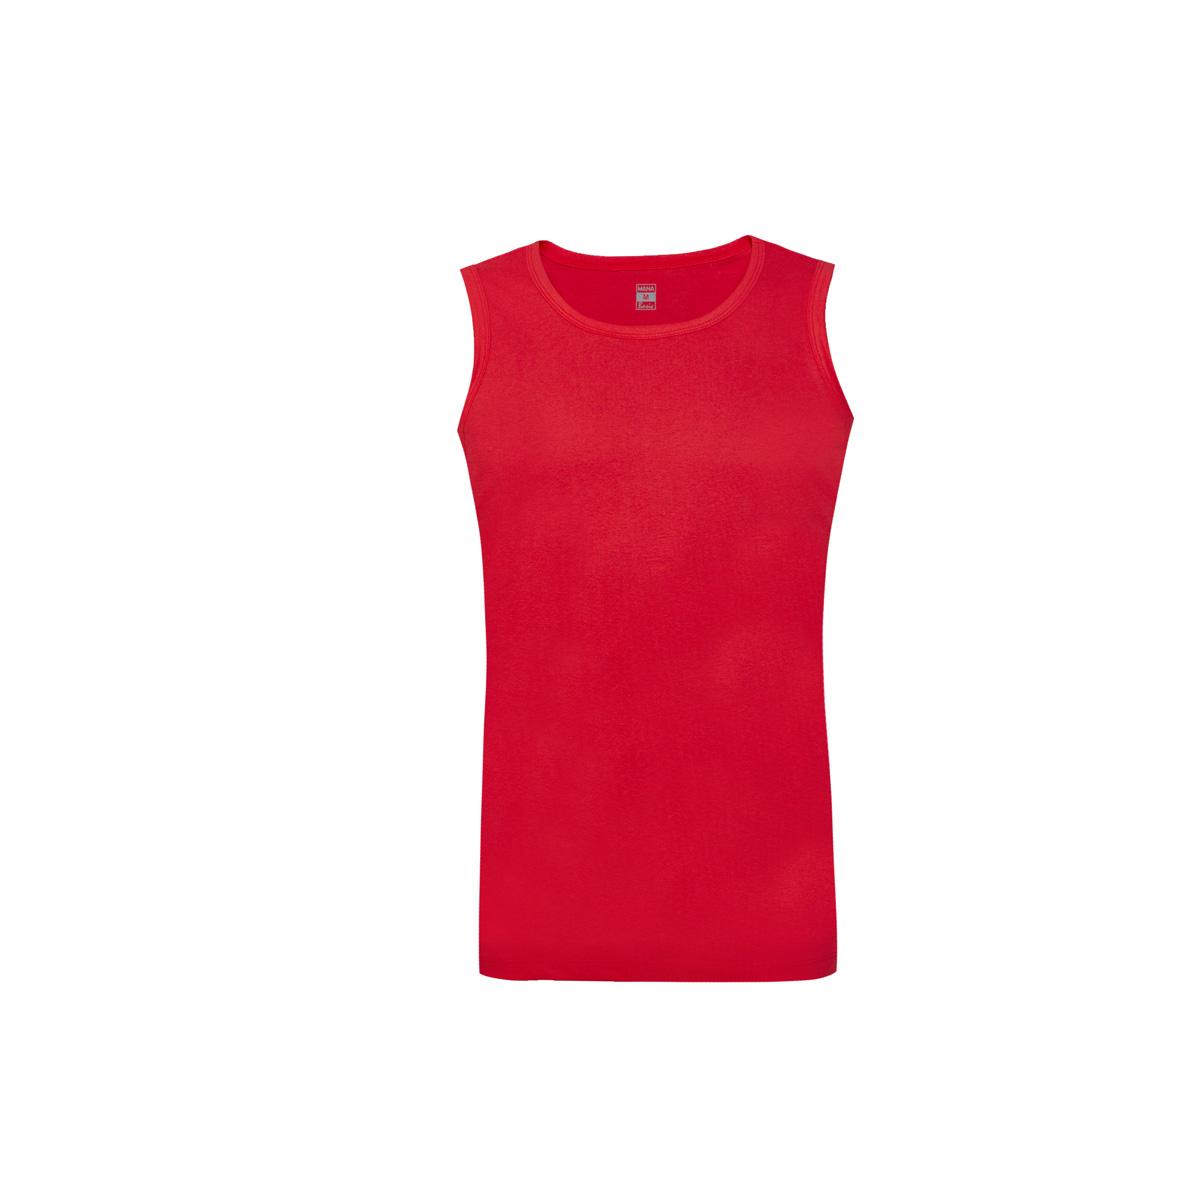 Moška majica, rdeča